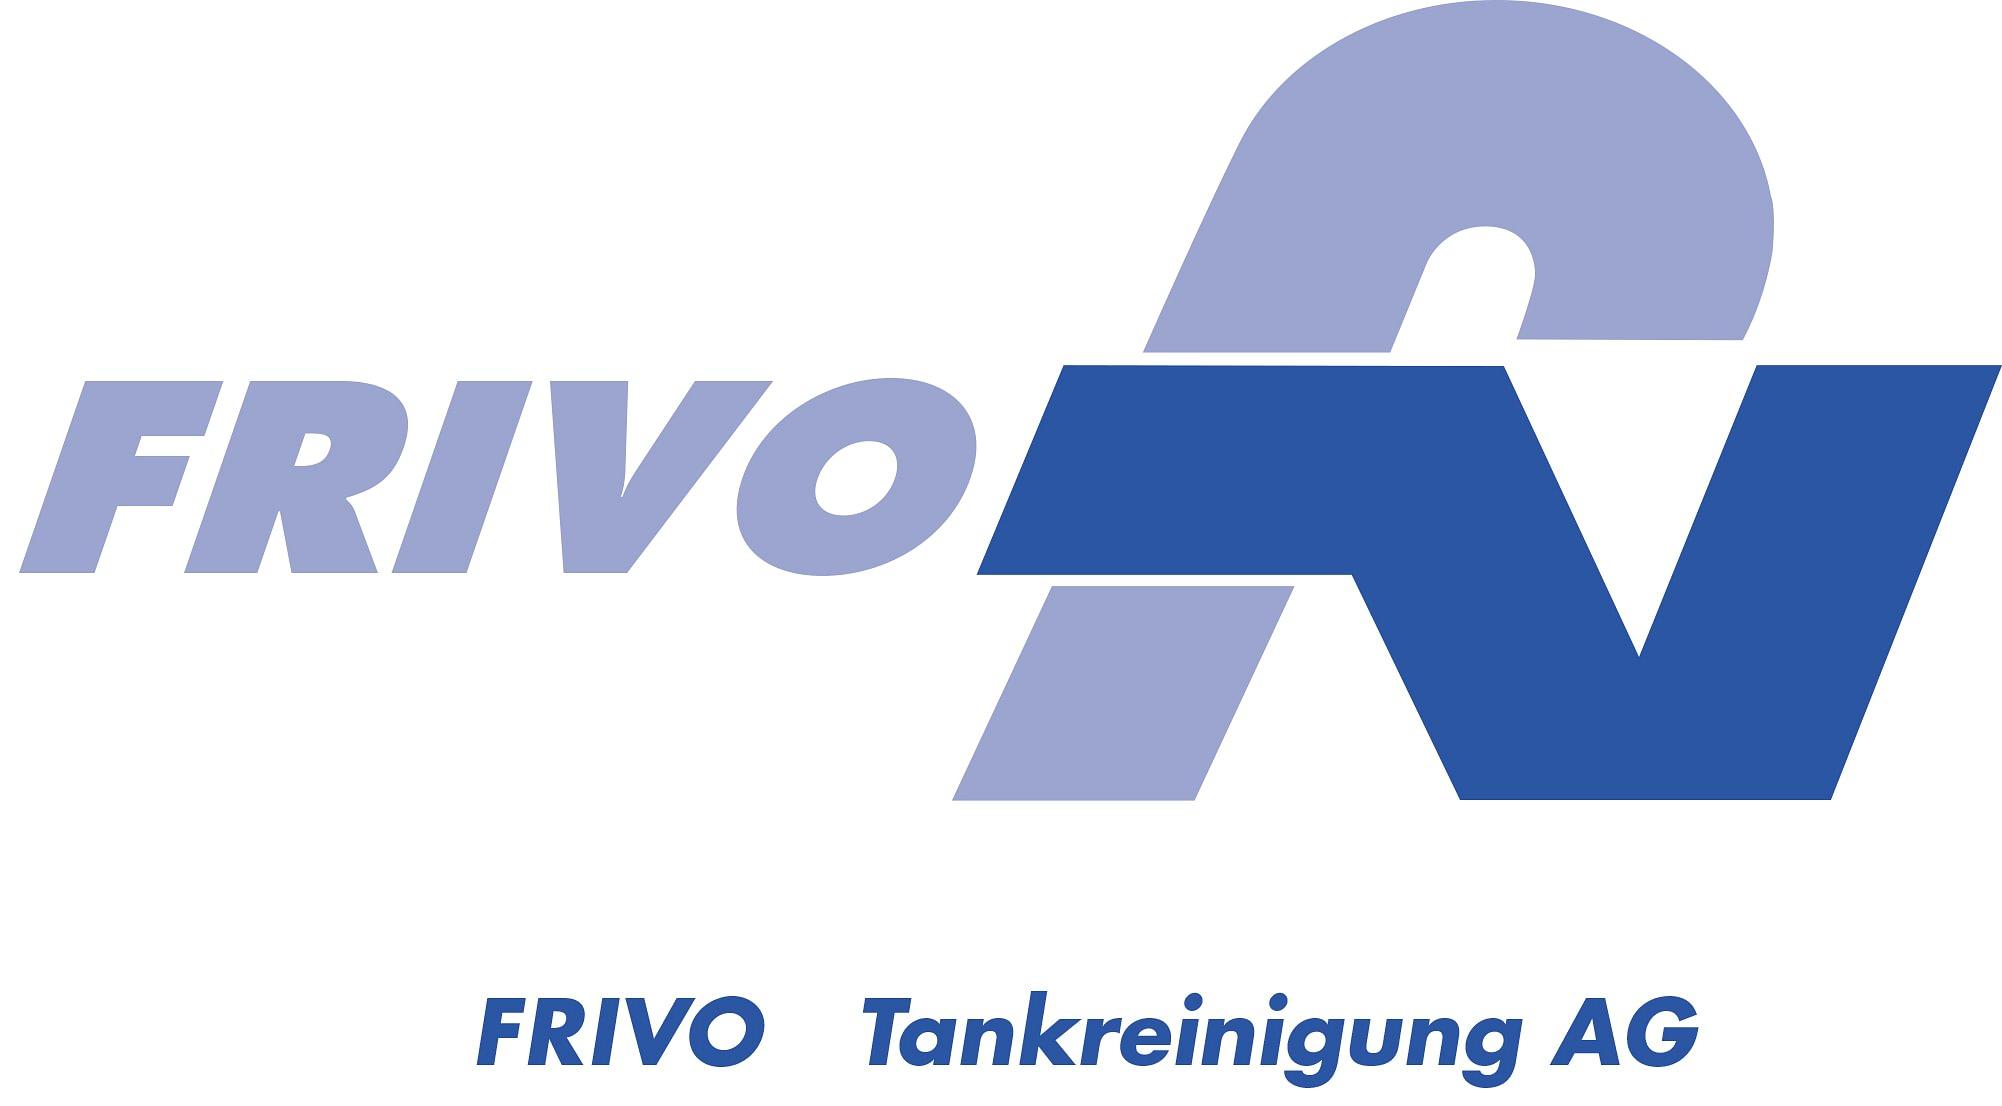 Frivo Tankreinigung AG